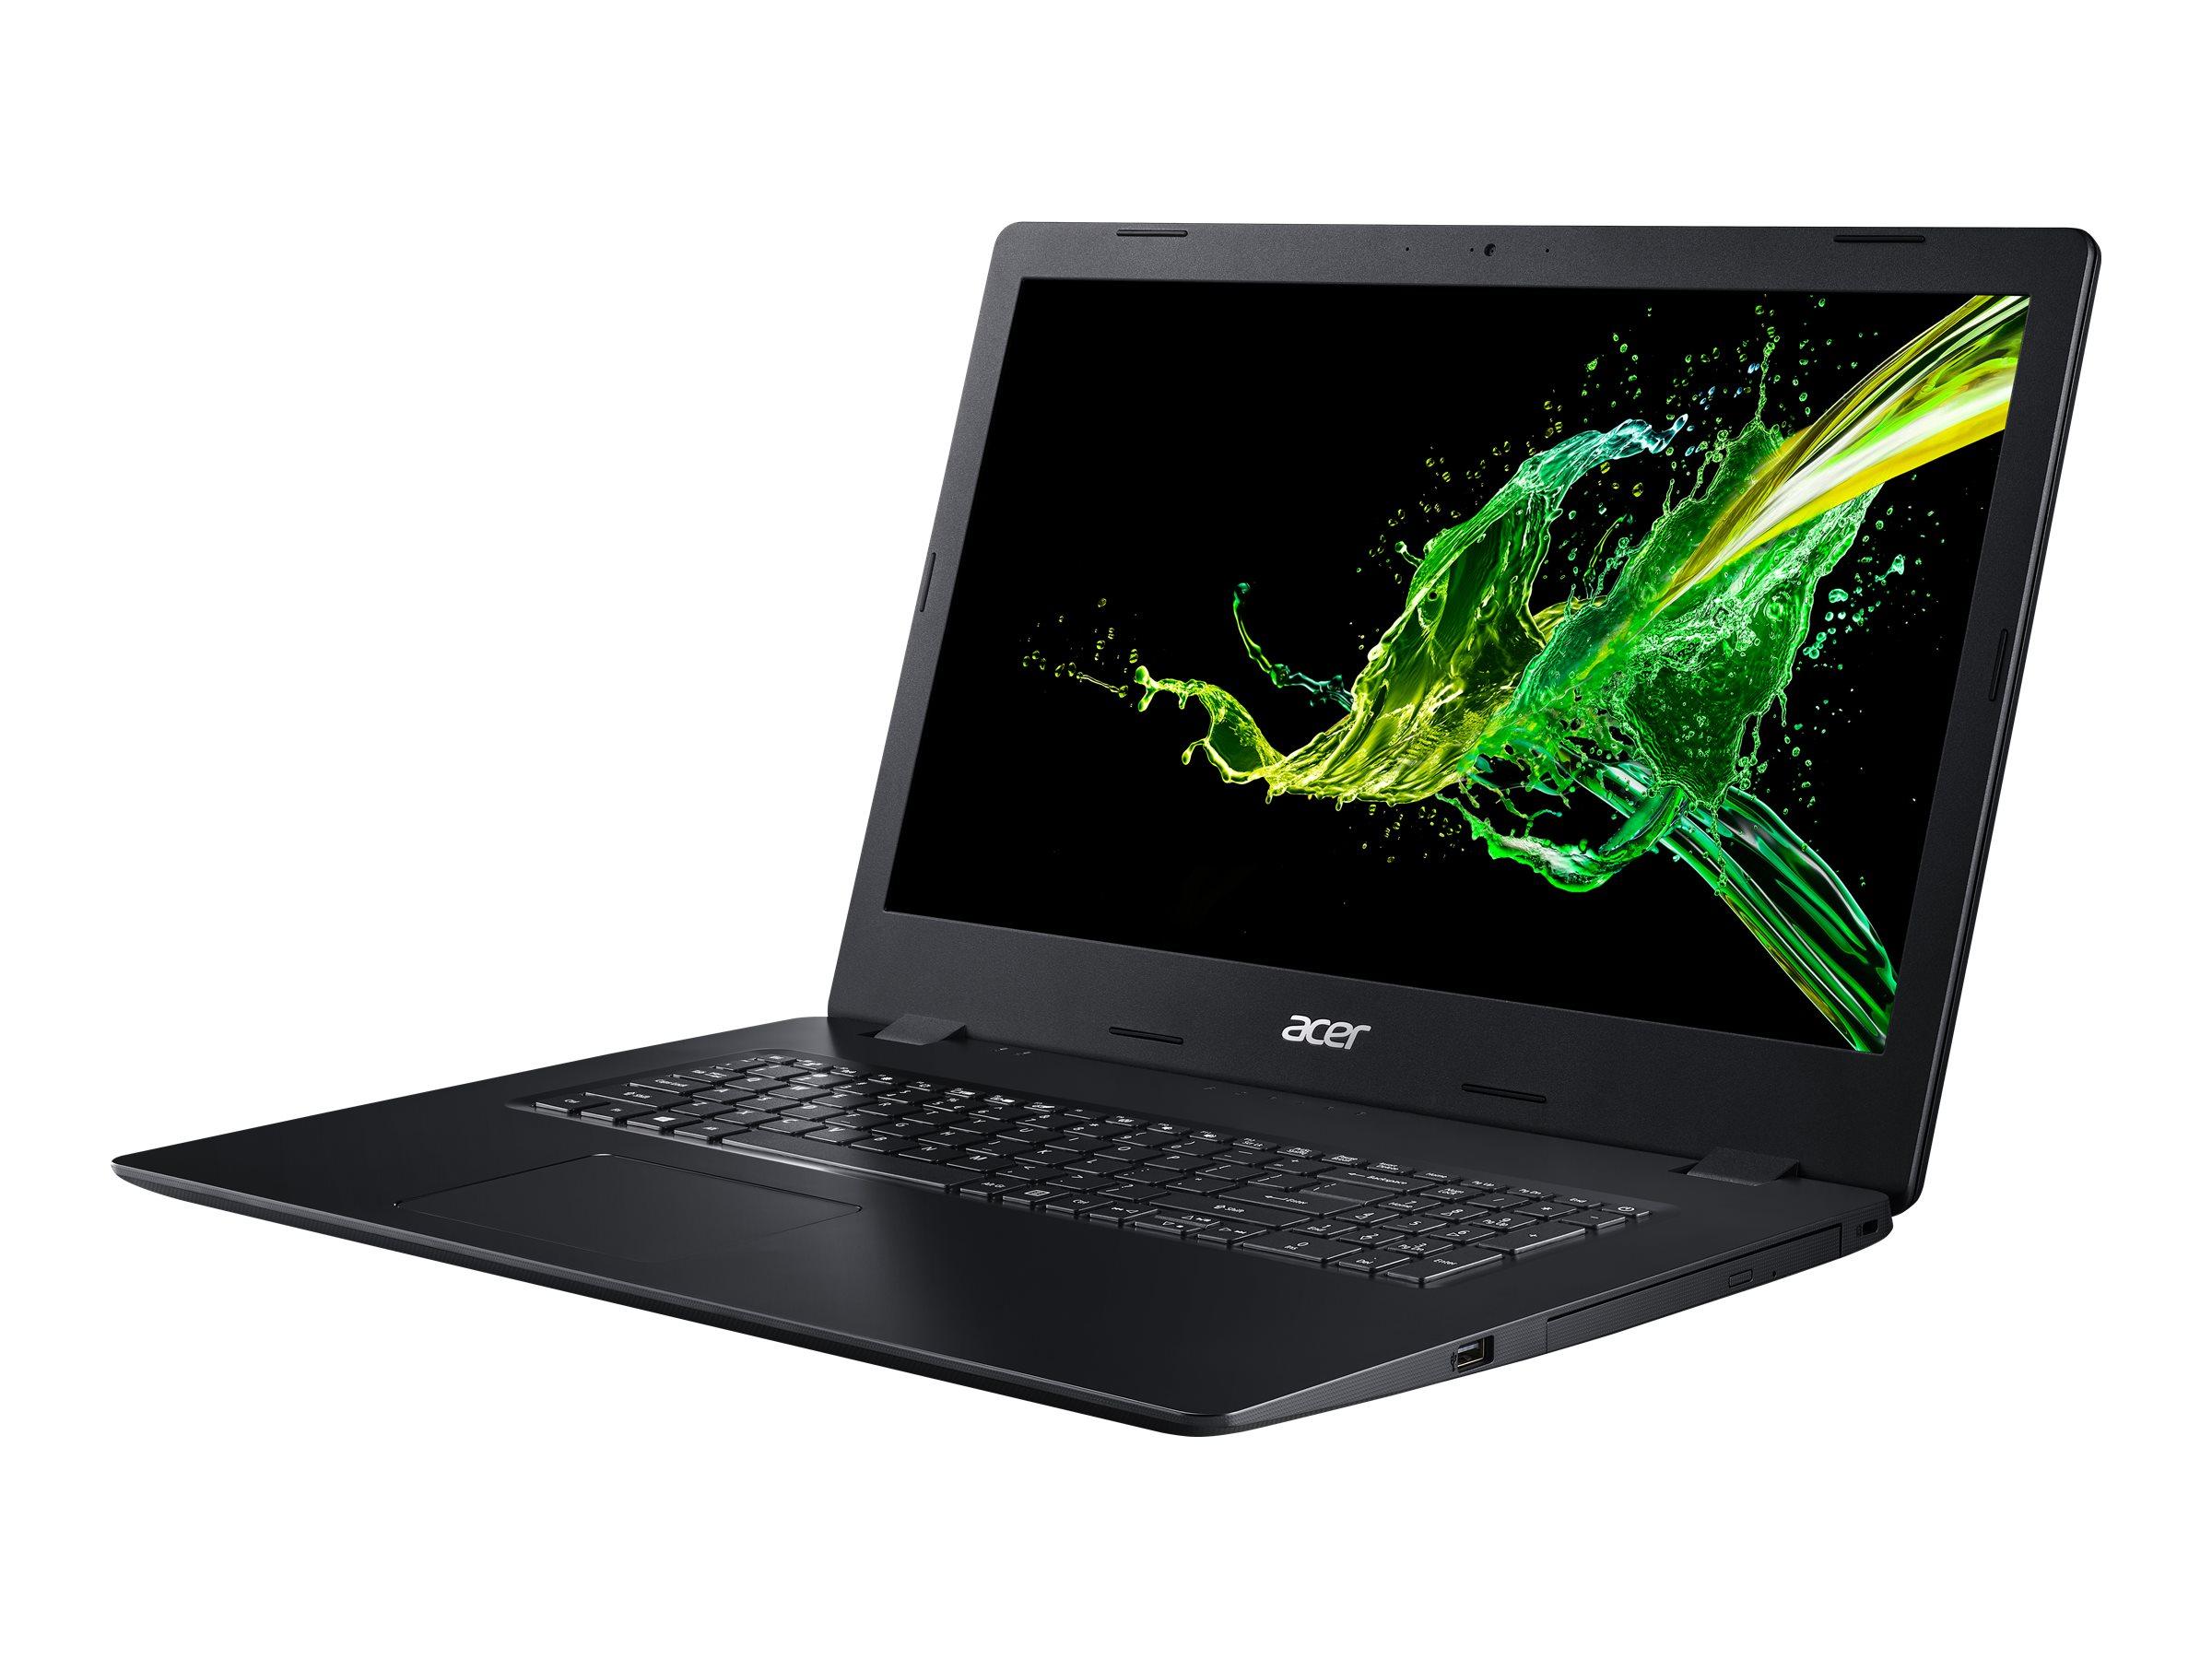 Acer Aspire 3 A317-51G-55R7 - Core i5 10210U / 1.6 GHz - Win 10 Home 64-Bit - 8 GB RAM - 1.024 TB SSD - DVD-Writer - 43.